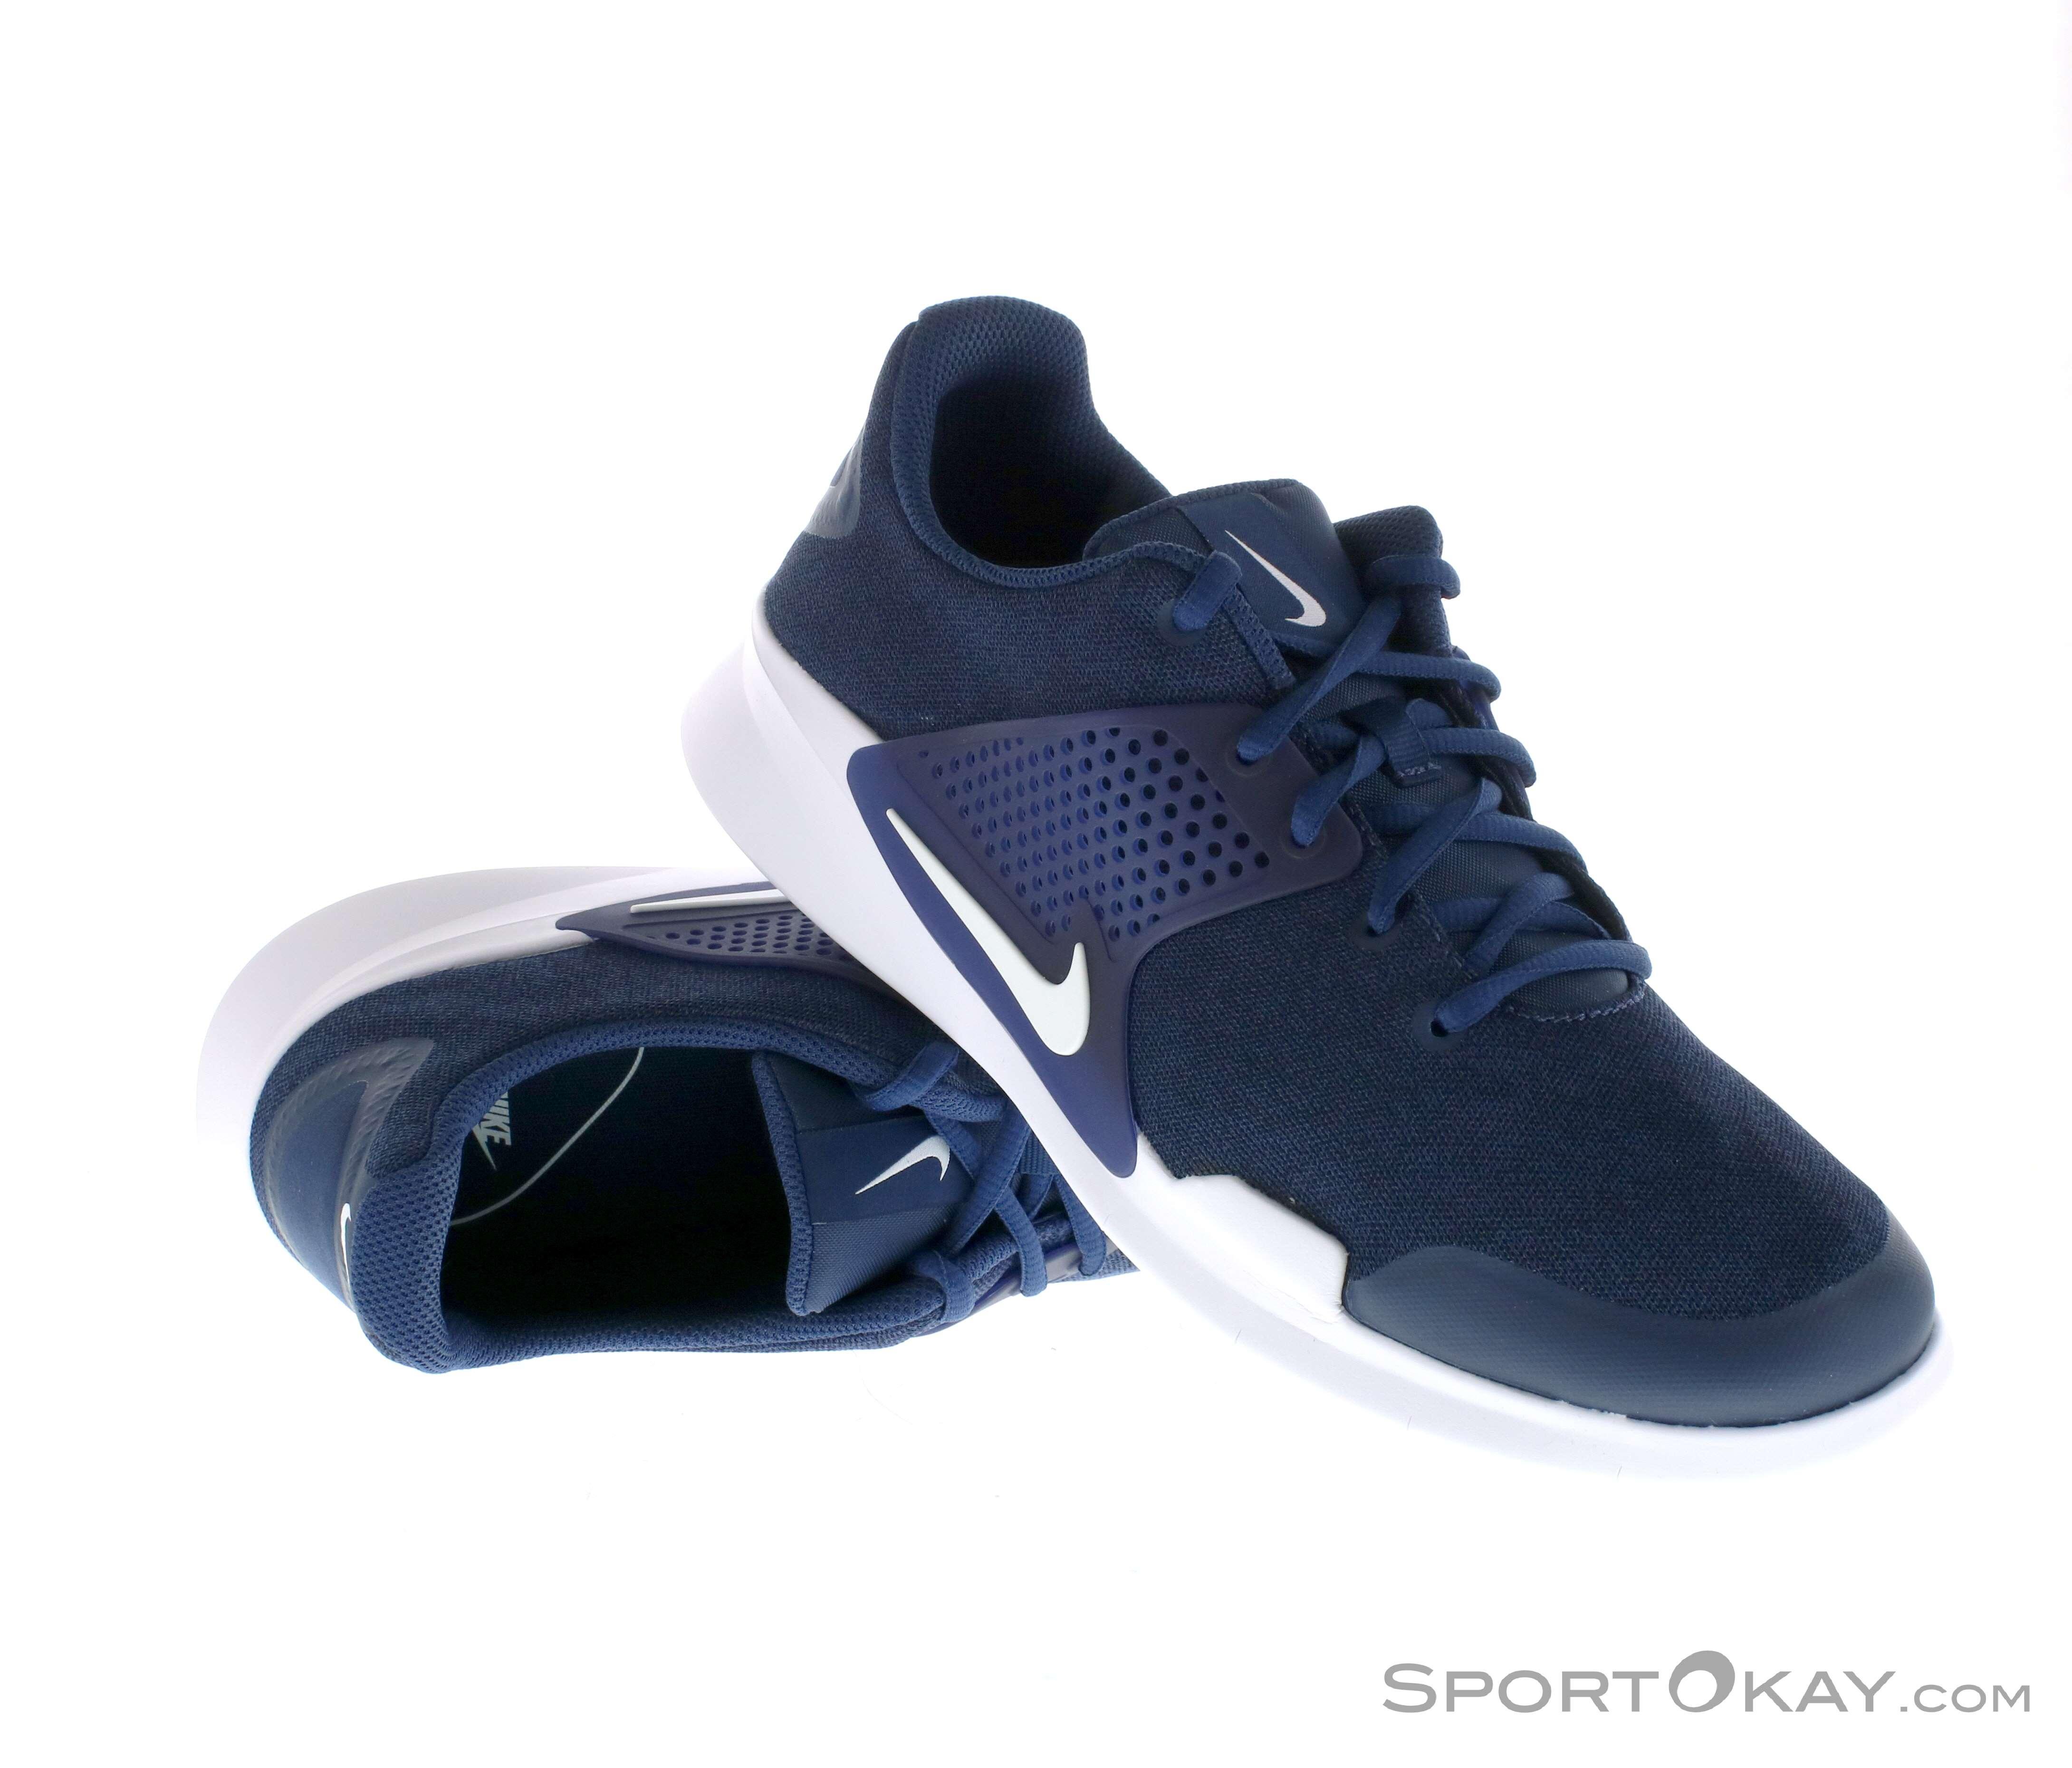 d106e07cf350 Nike Arrowz Herren Laufschuhe - Straßenlaufschuhe - Laufschuhe ...